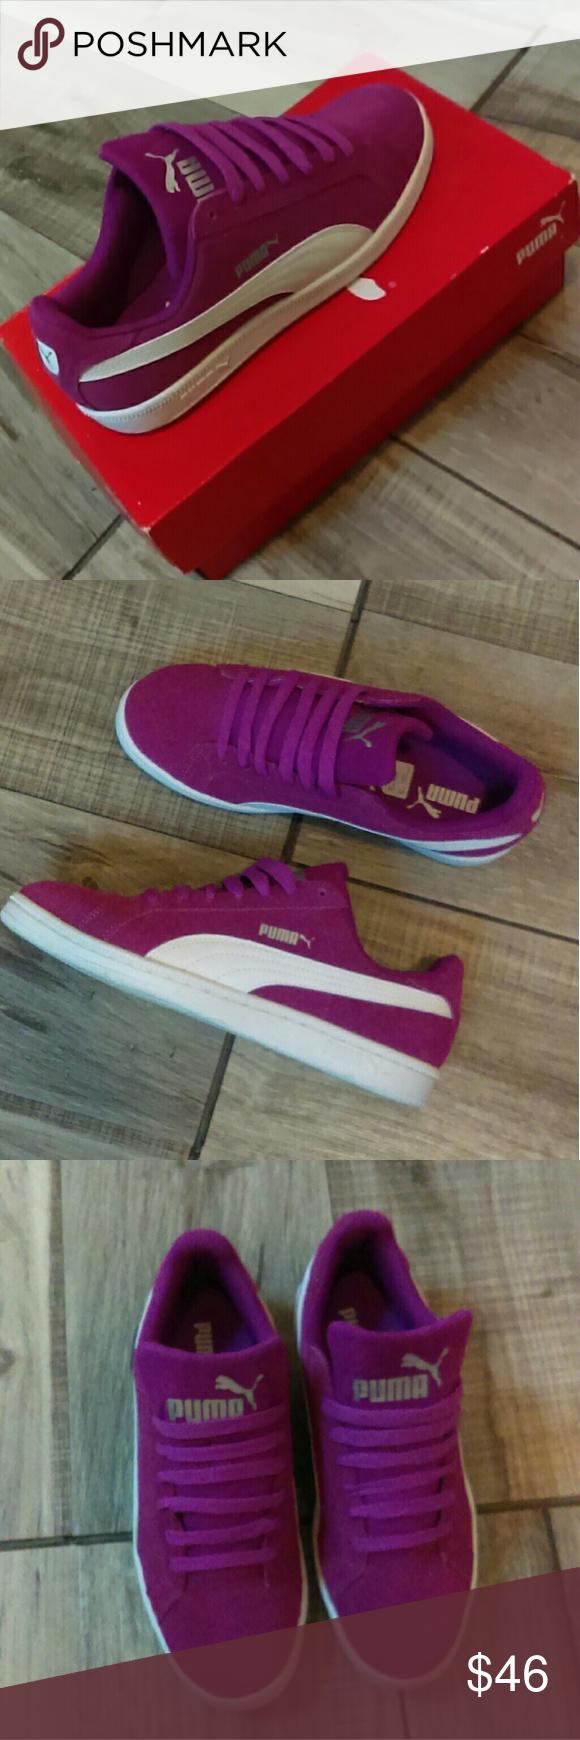 best sneakers a81a7 a9c79 Puma Big Kids Youth Shoes Size 6 Puma Hollyhock Juniors casual shoes. Puma  Smash Fun